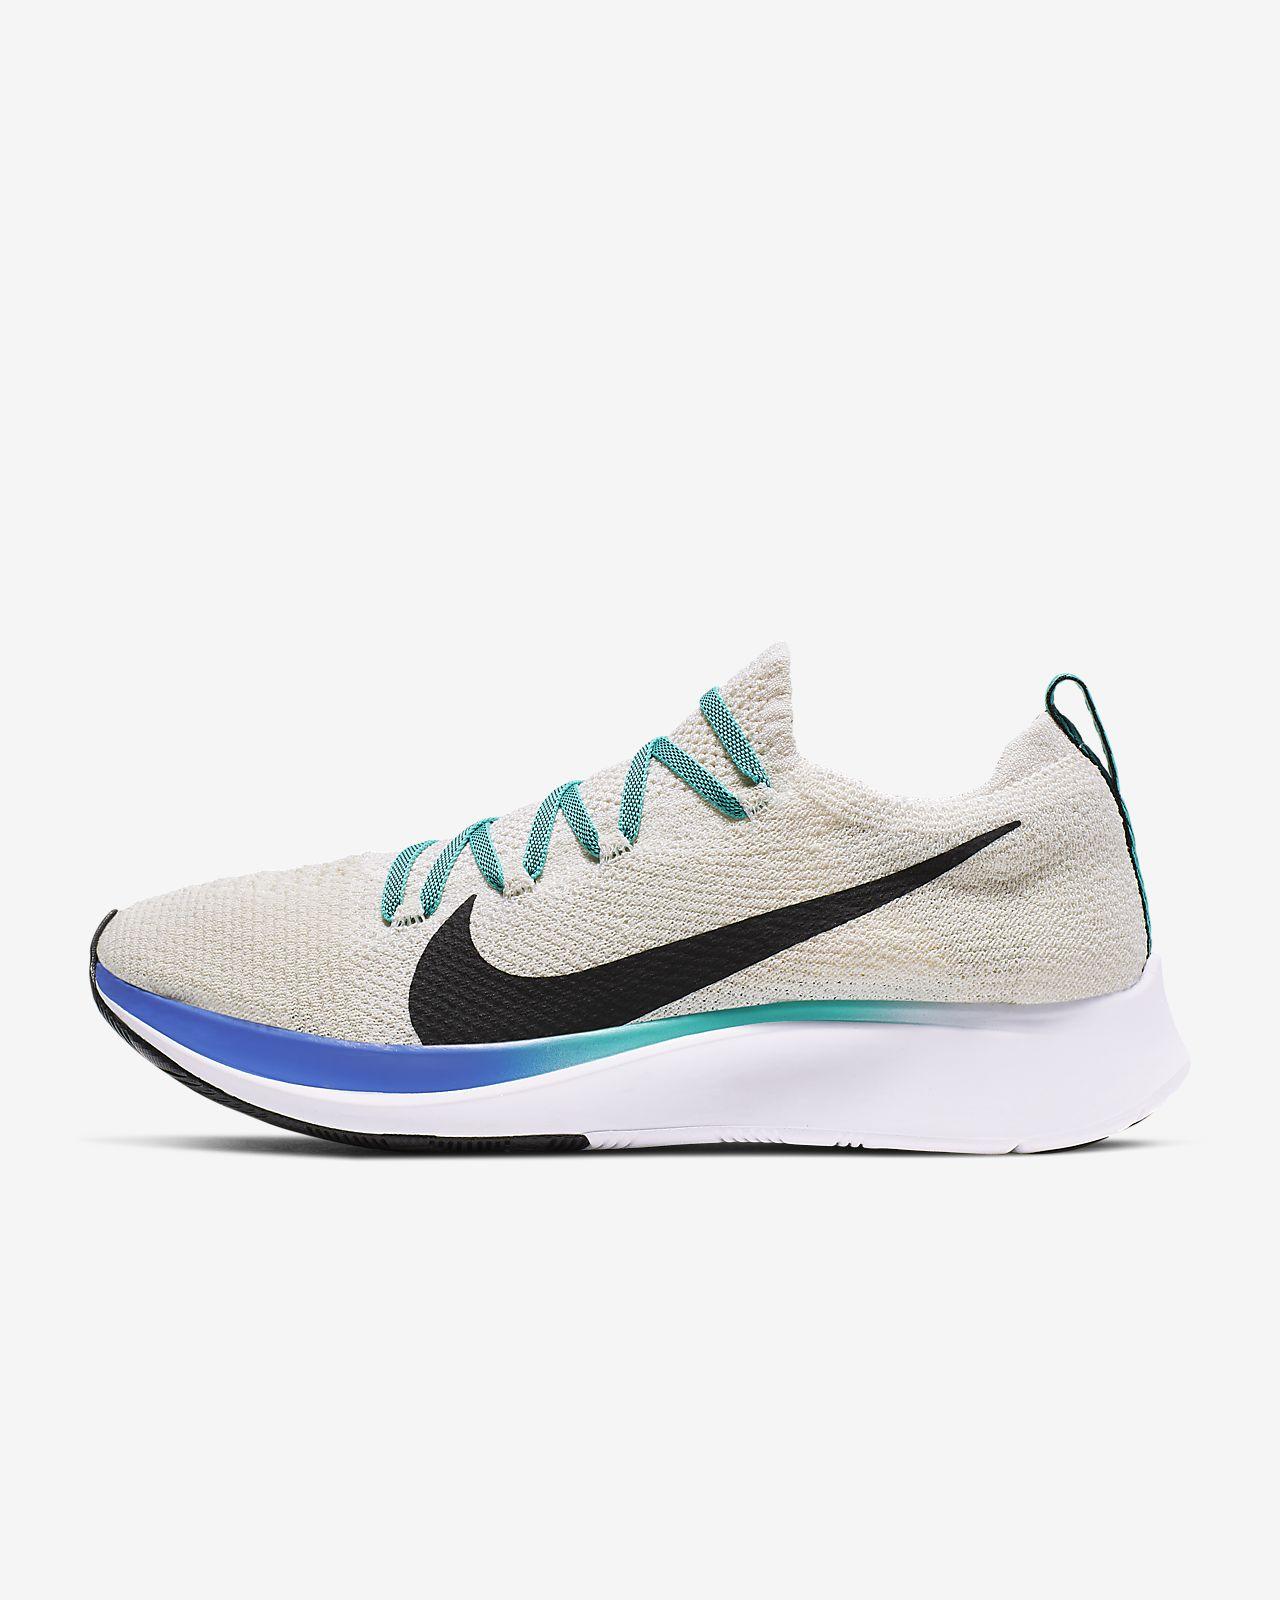 Nike Zoom Fly Flyknit Hardloopschoen voor dames